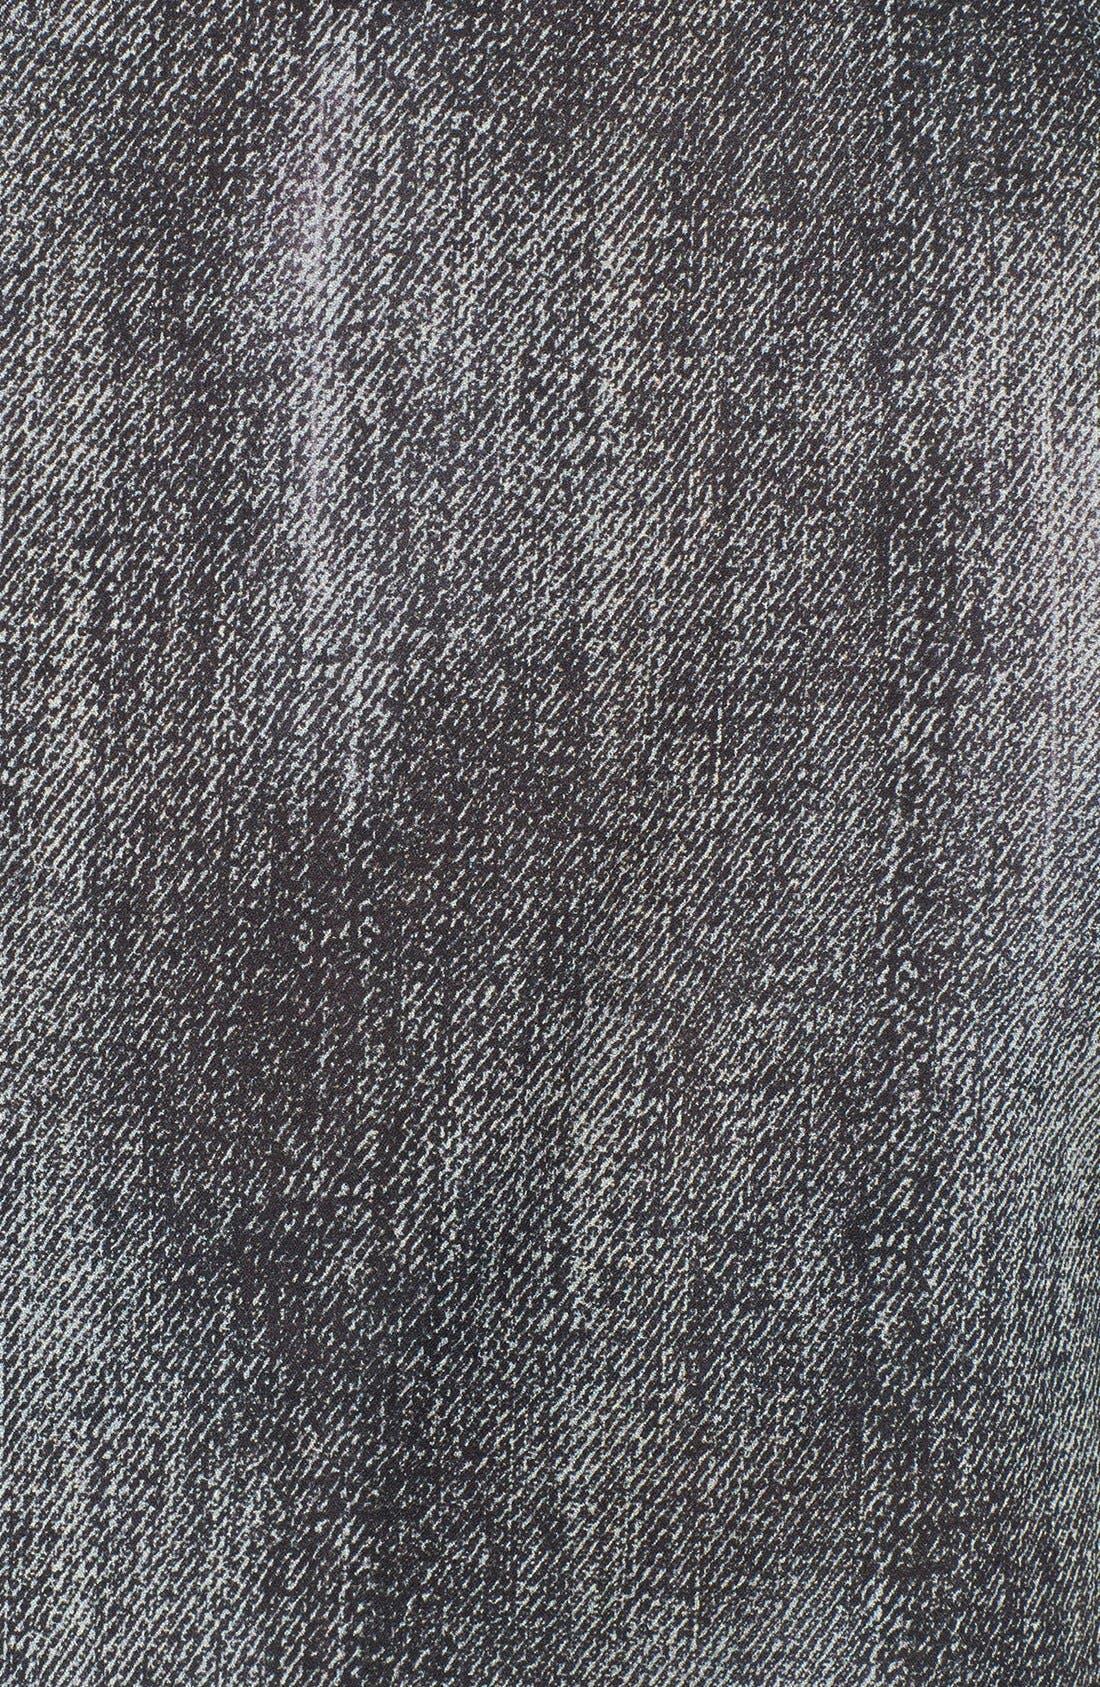 Alternate Image 3  - Eileen Fisher Print Scoop Neck Silk Shell (Regular & Petite)